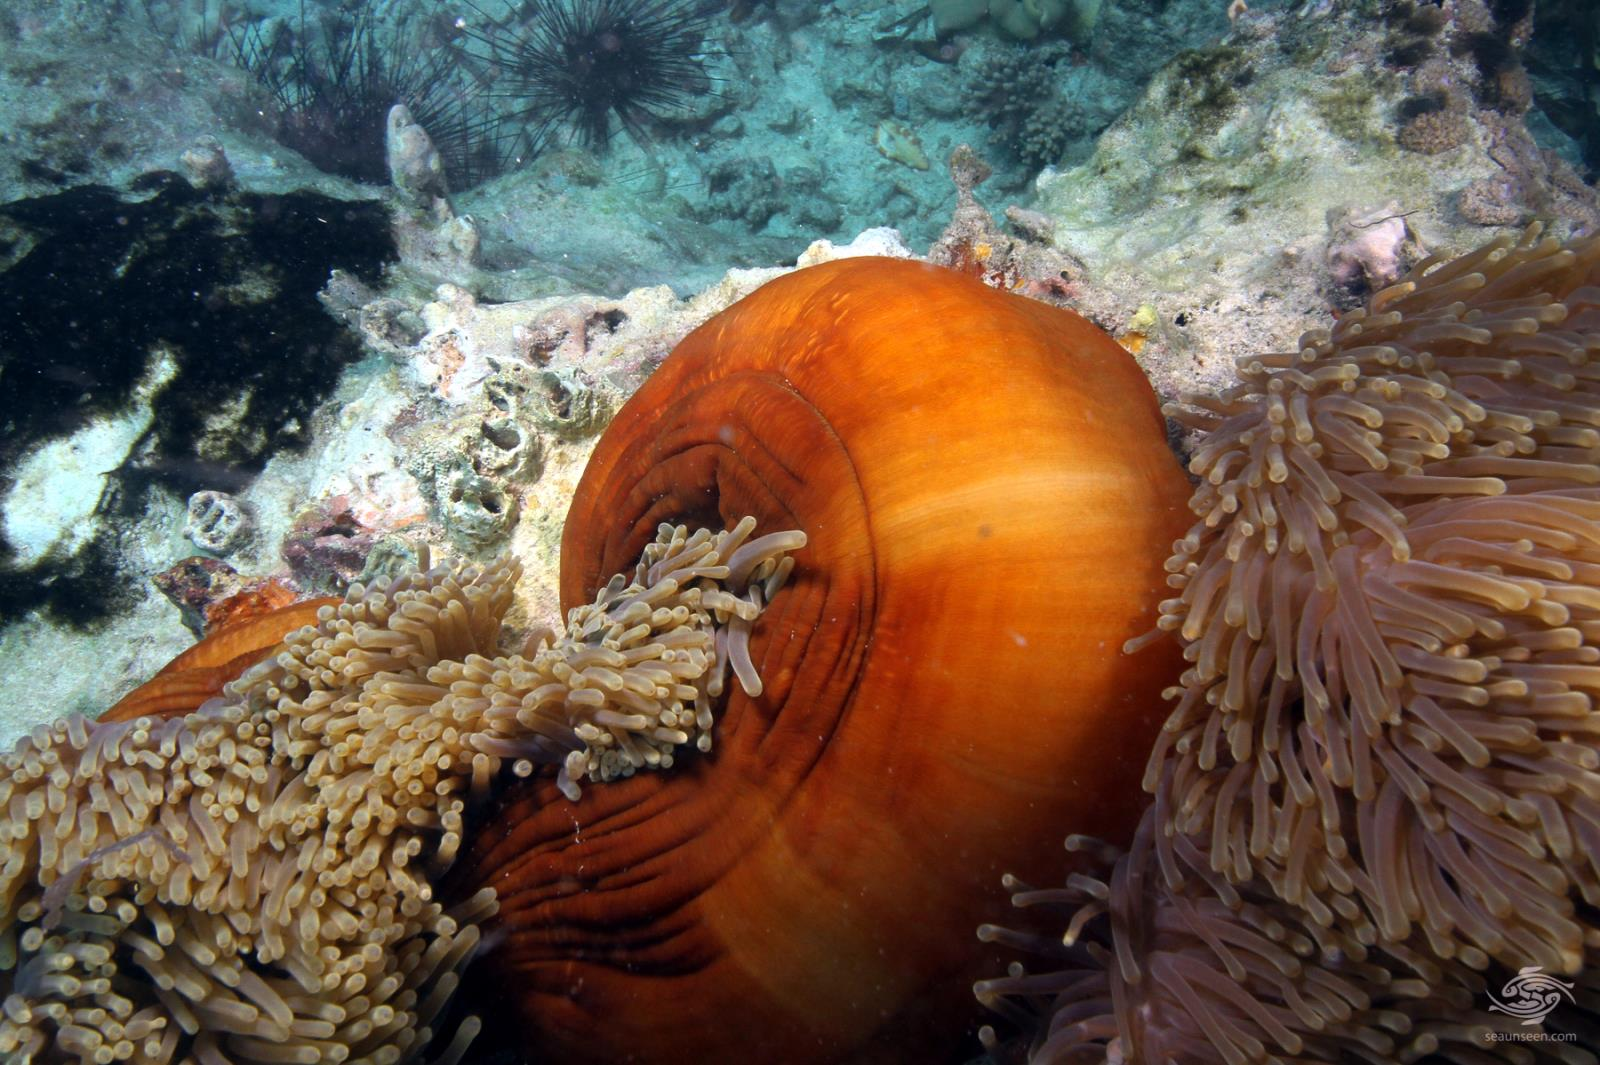 magnificent anemone, Heteractis magnifica Tanzania diving9